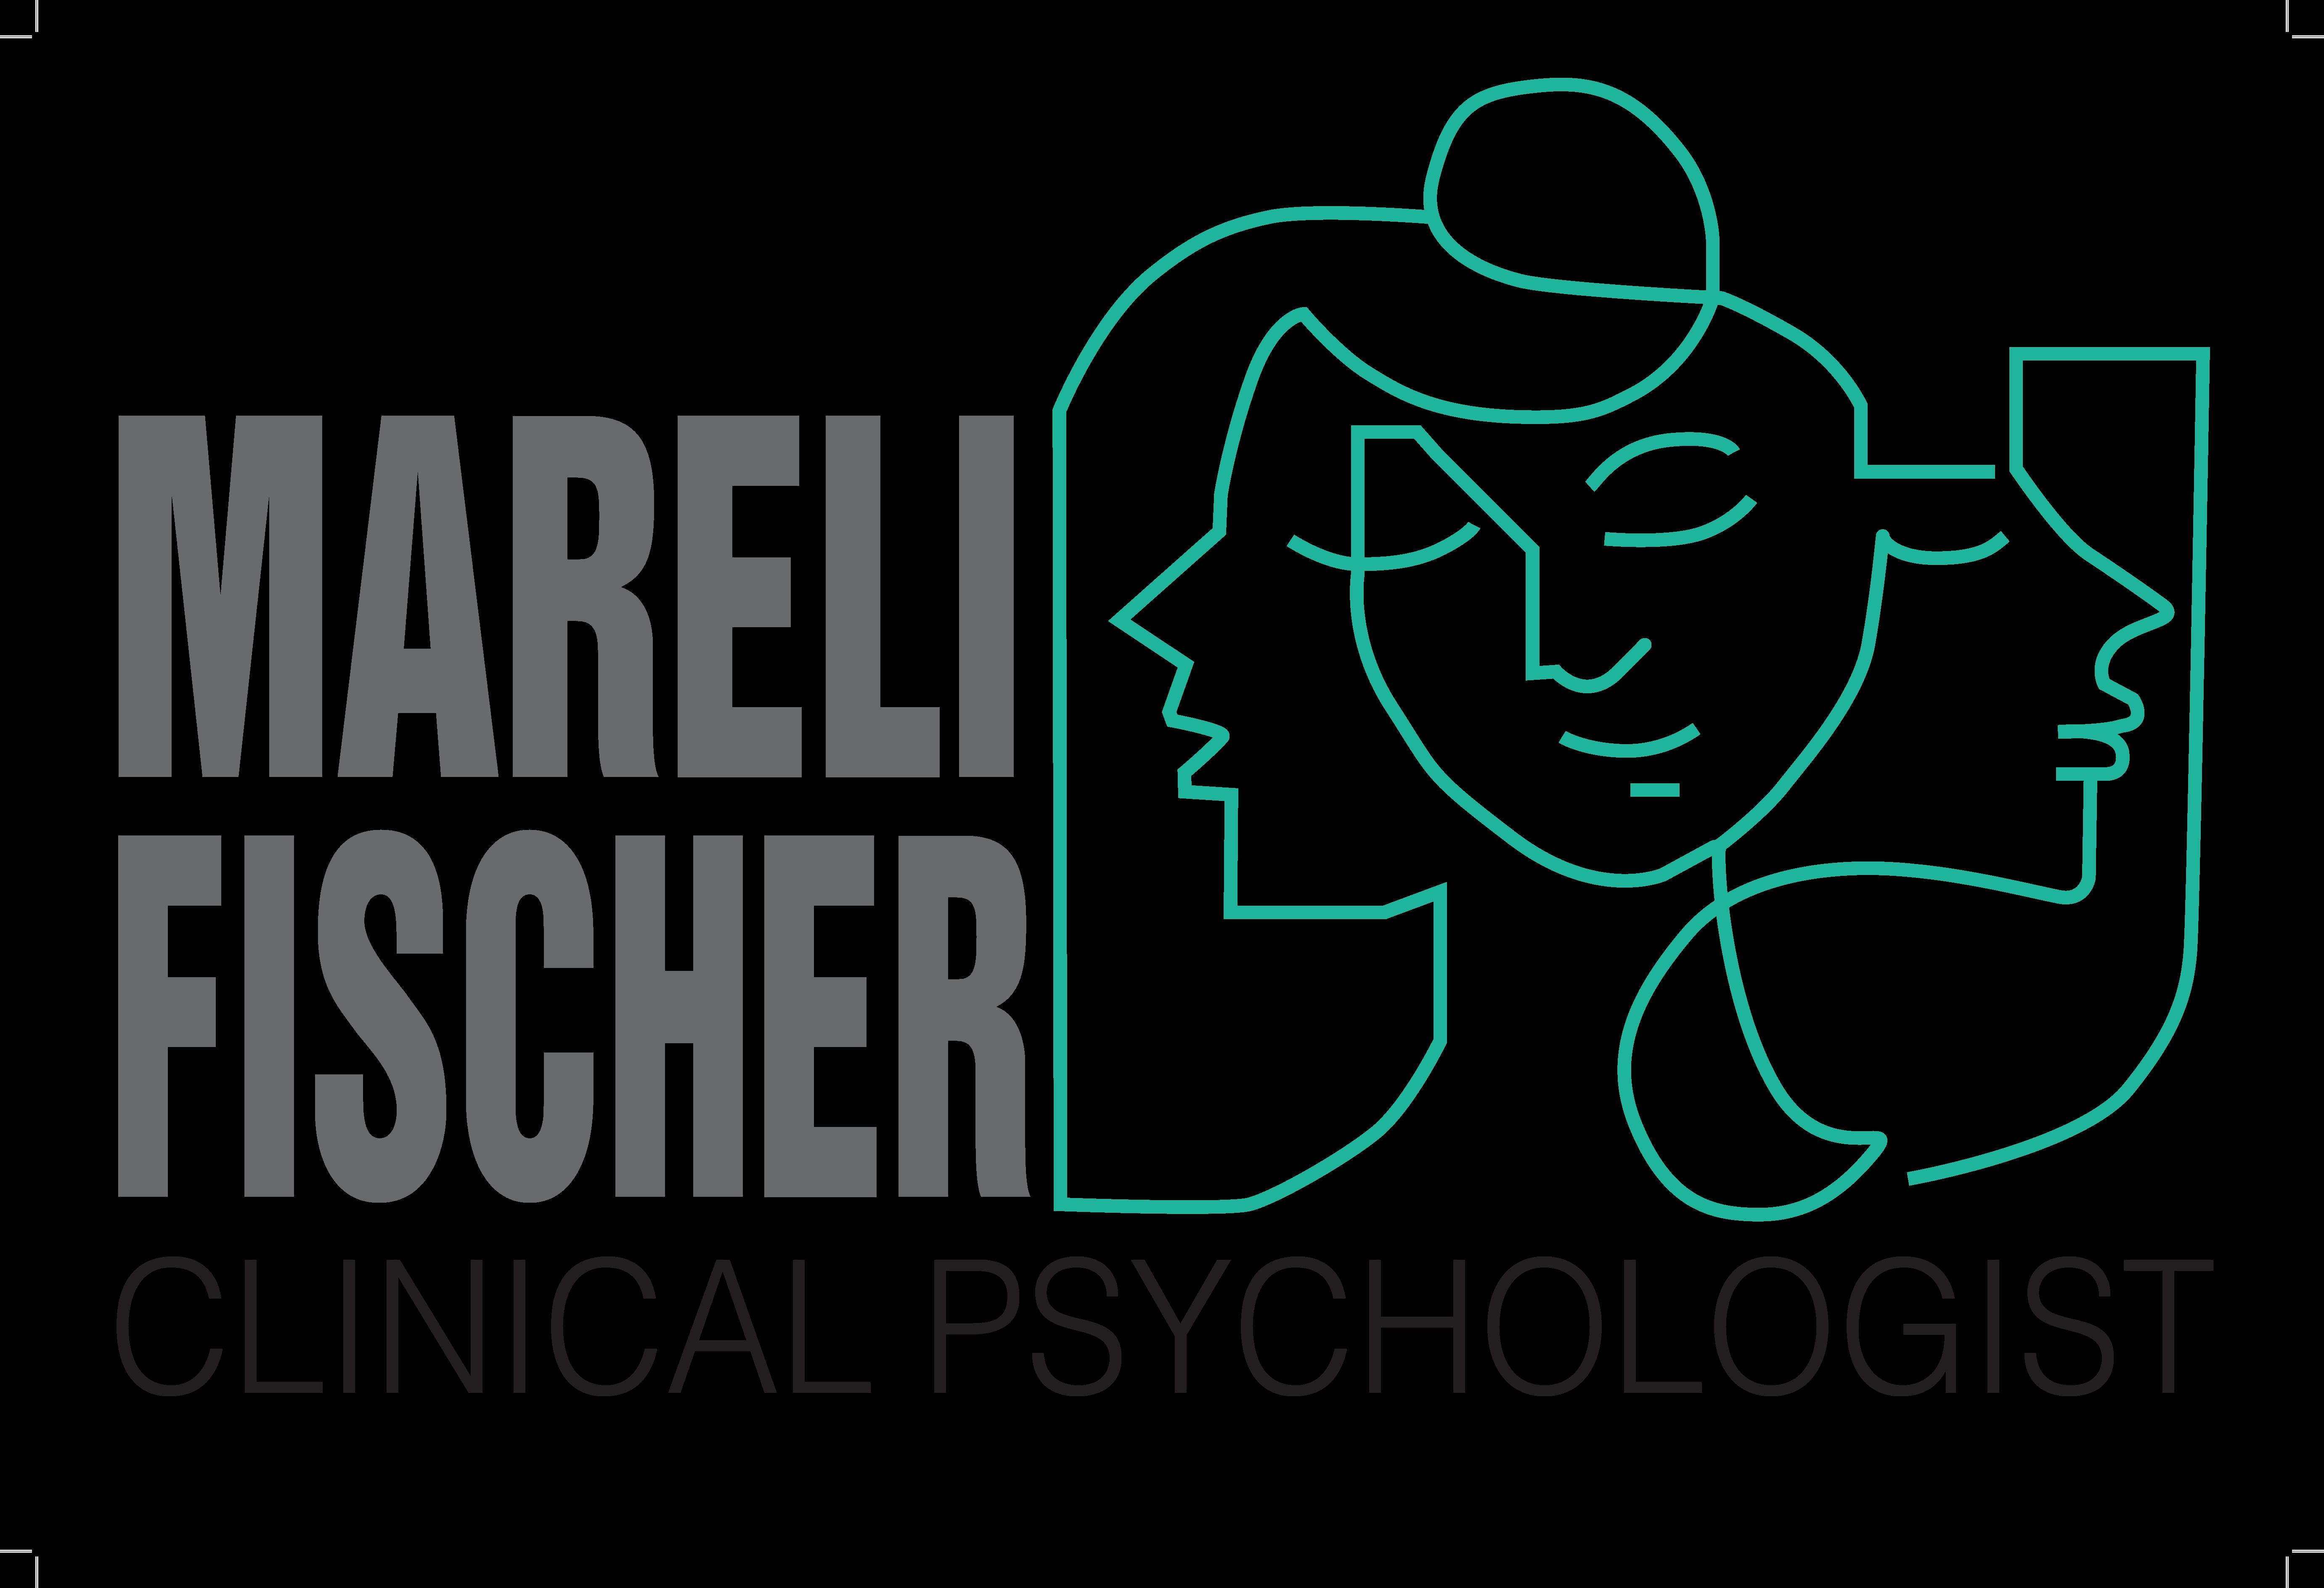 Mareli Fischer